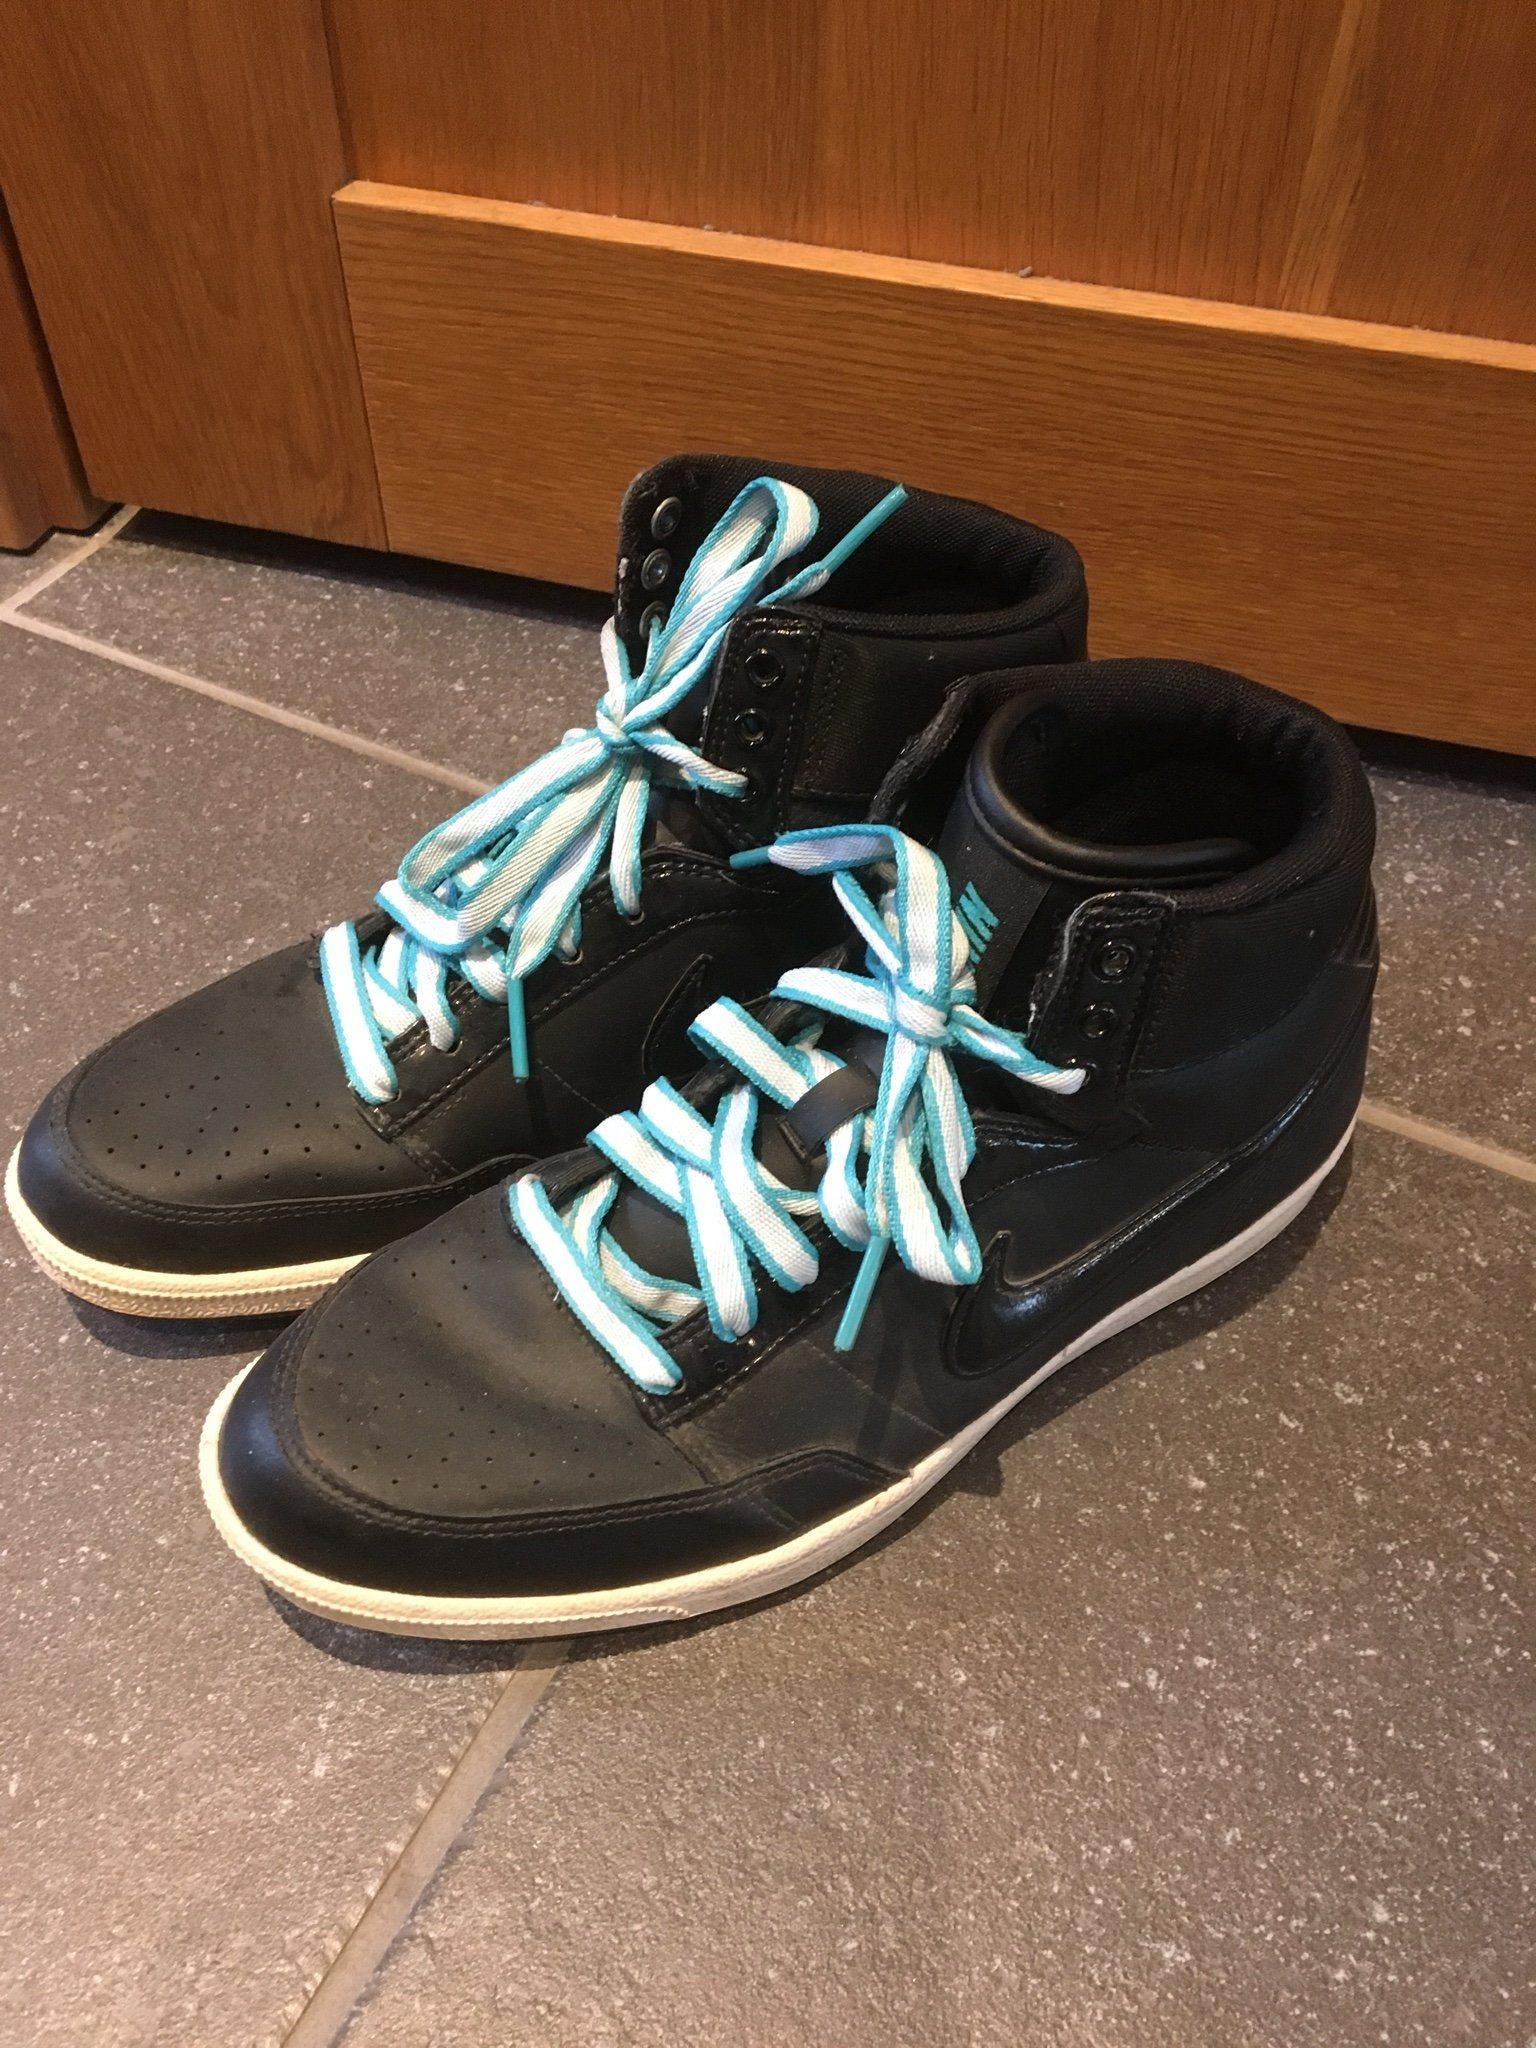 the latest 87601 0ce77 Nike sneakers, kängor, gymnastikskor, gympaskor stl 40 uk stl 6 us stl 8